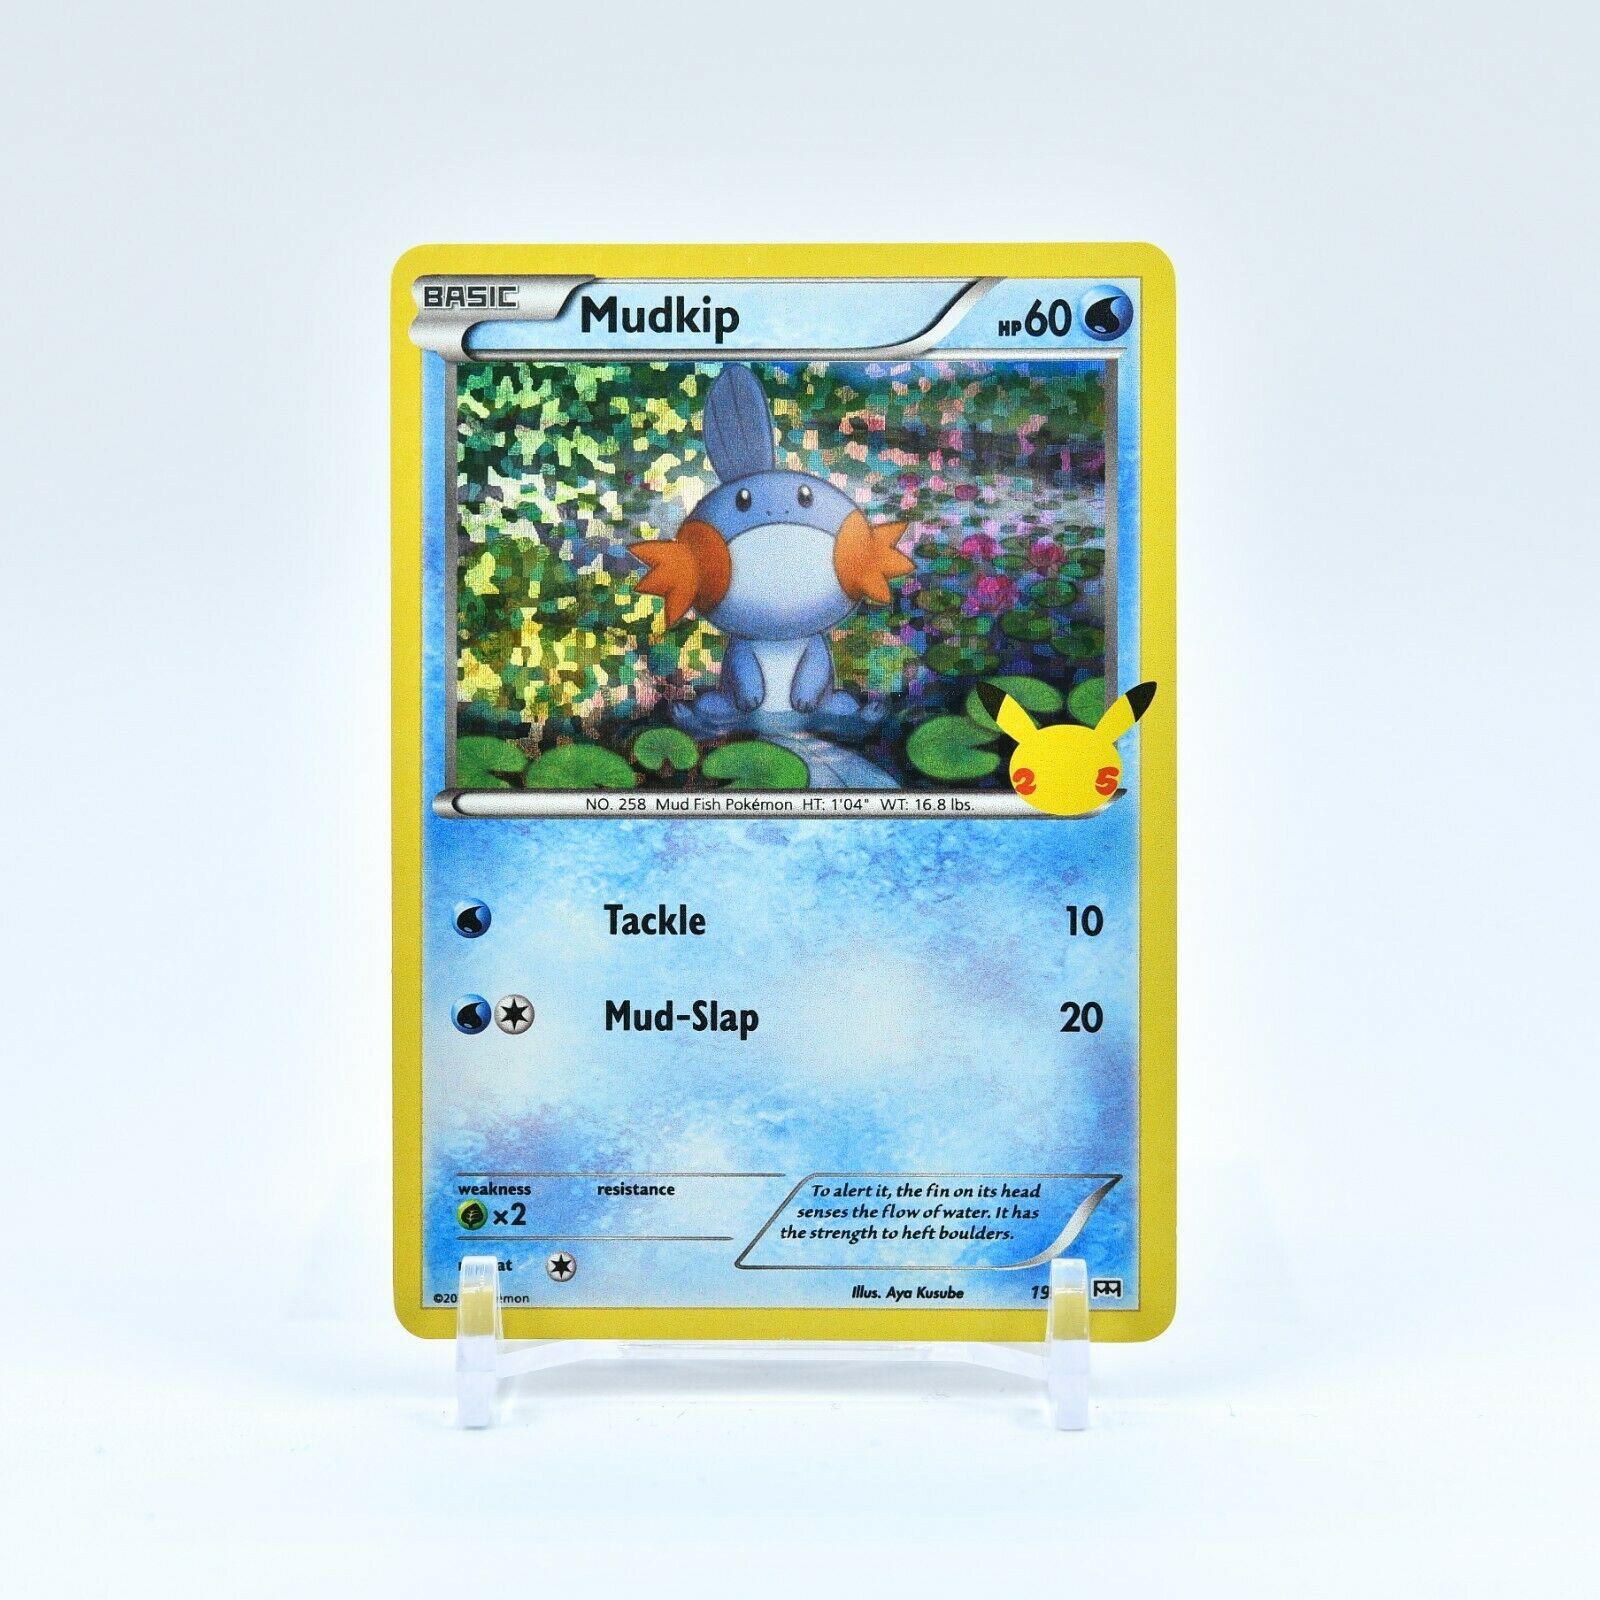 Mudkip - 19/25 Mcdonald's 25th Anniversary Holo Starter Pokemon - NM/MINT